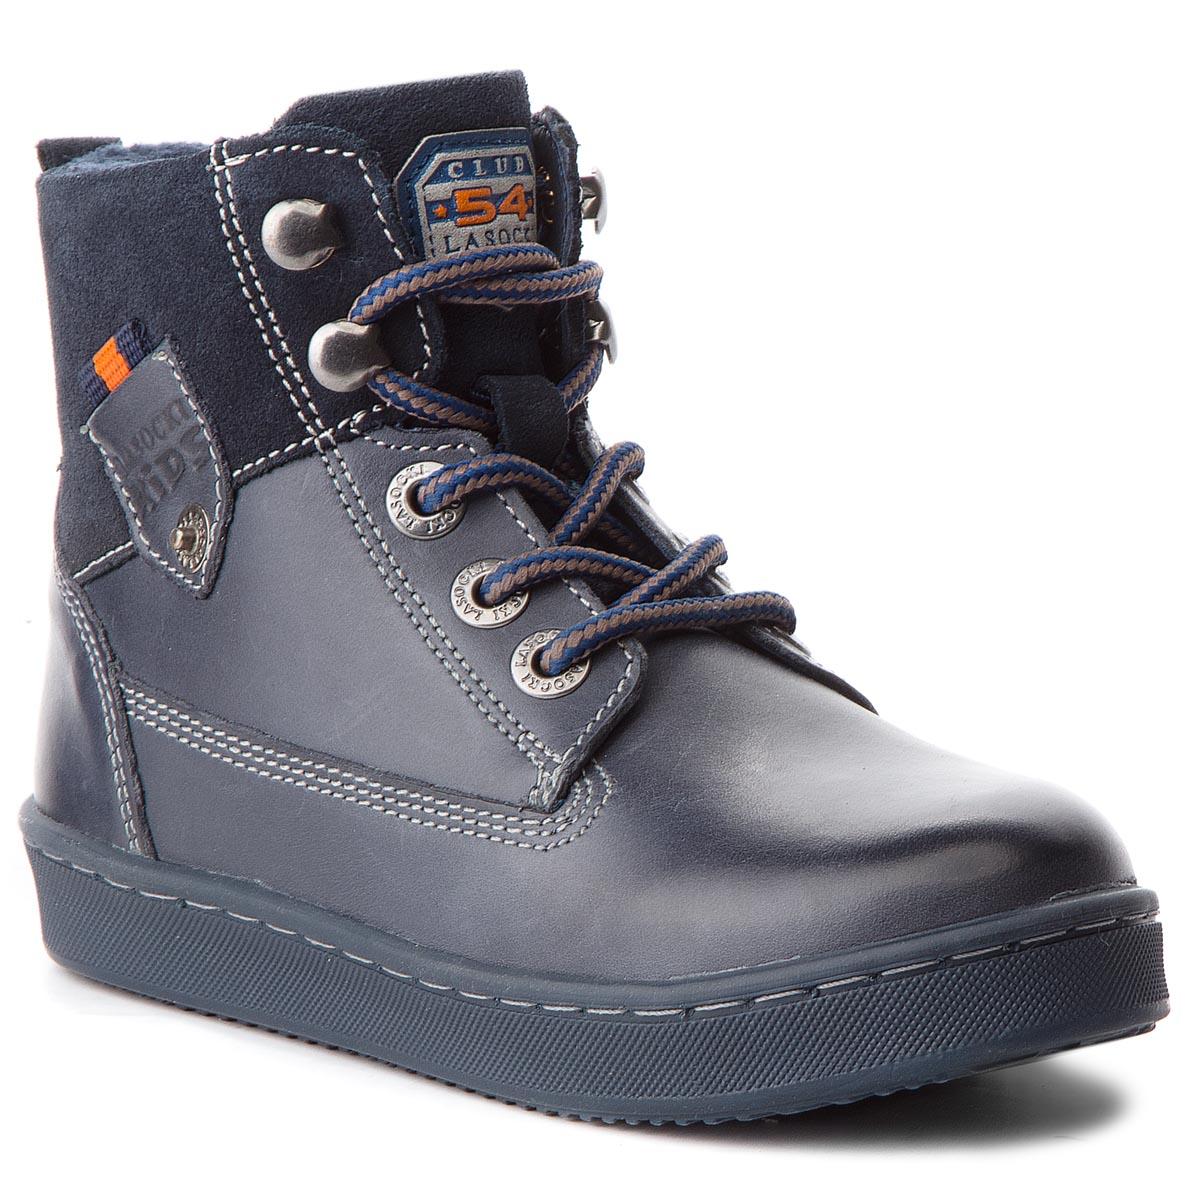 Outdoorová obuv LASOCKI KIDS - CI12-ERYK-01 Tmavo modrá